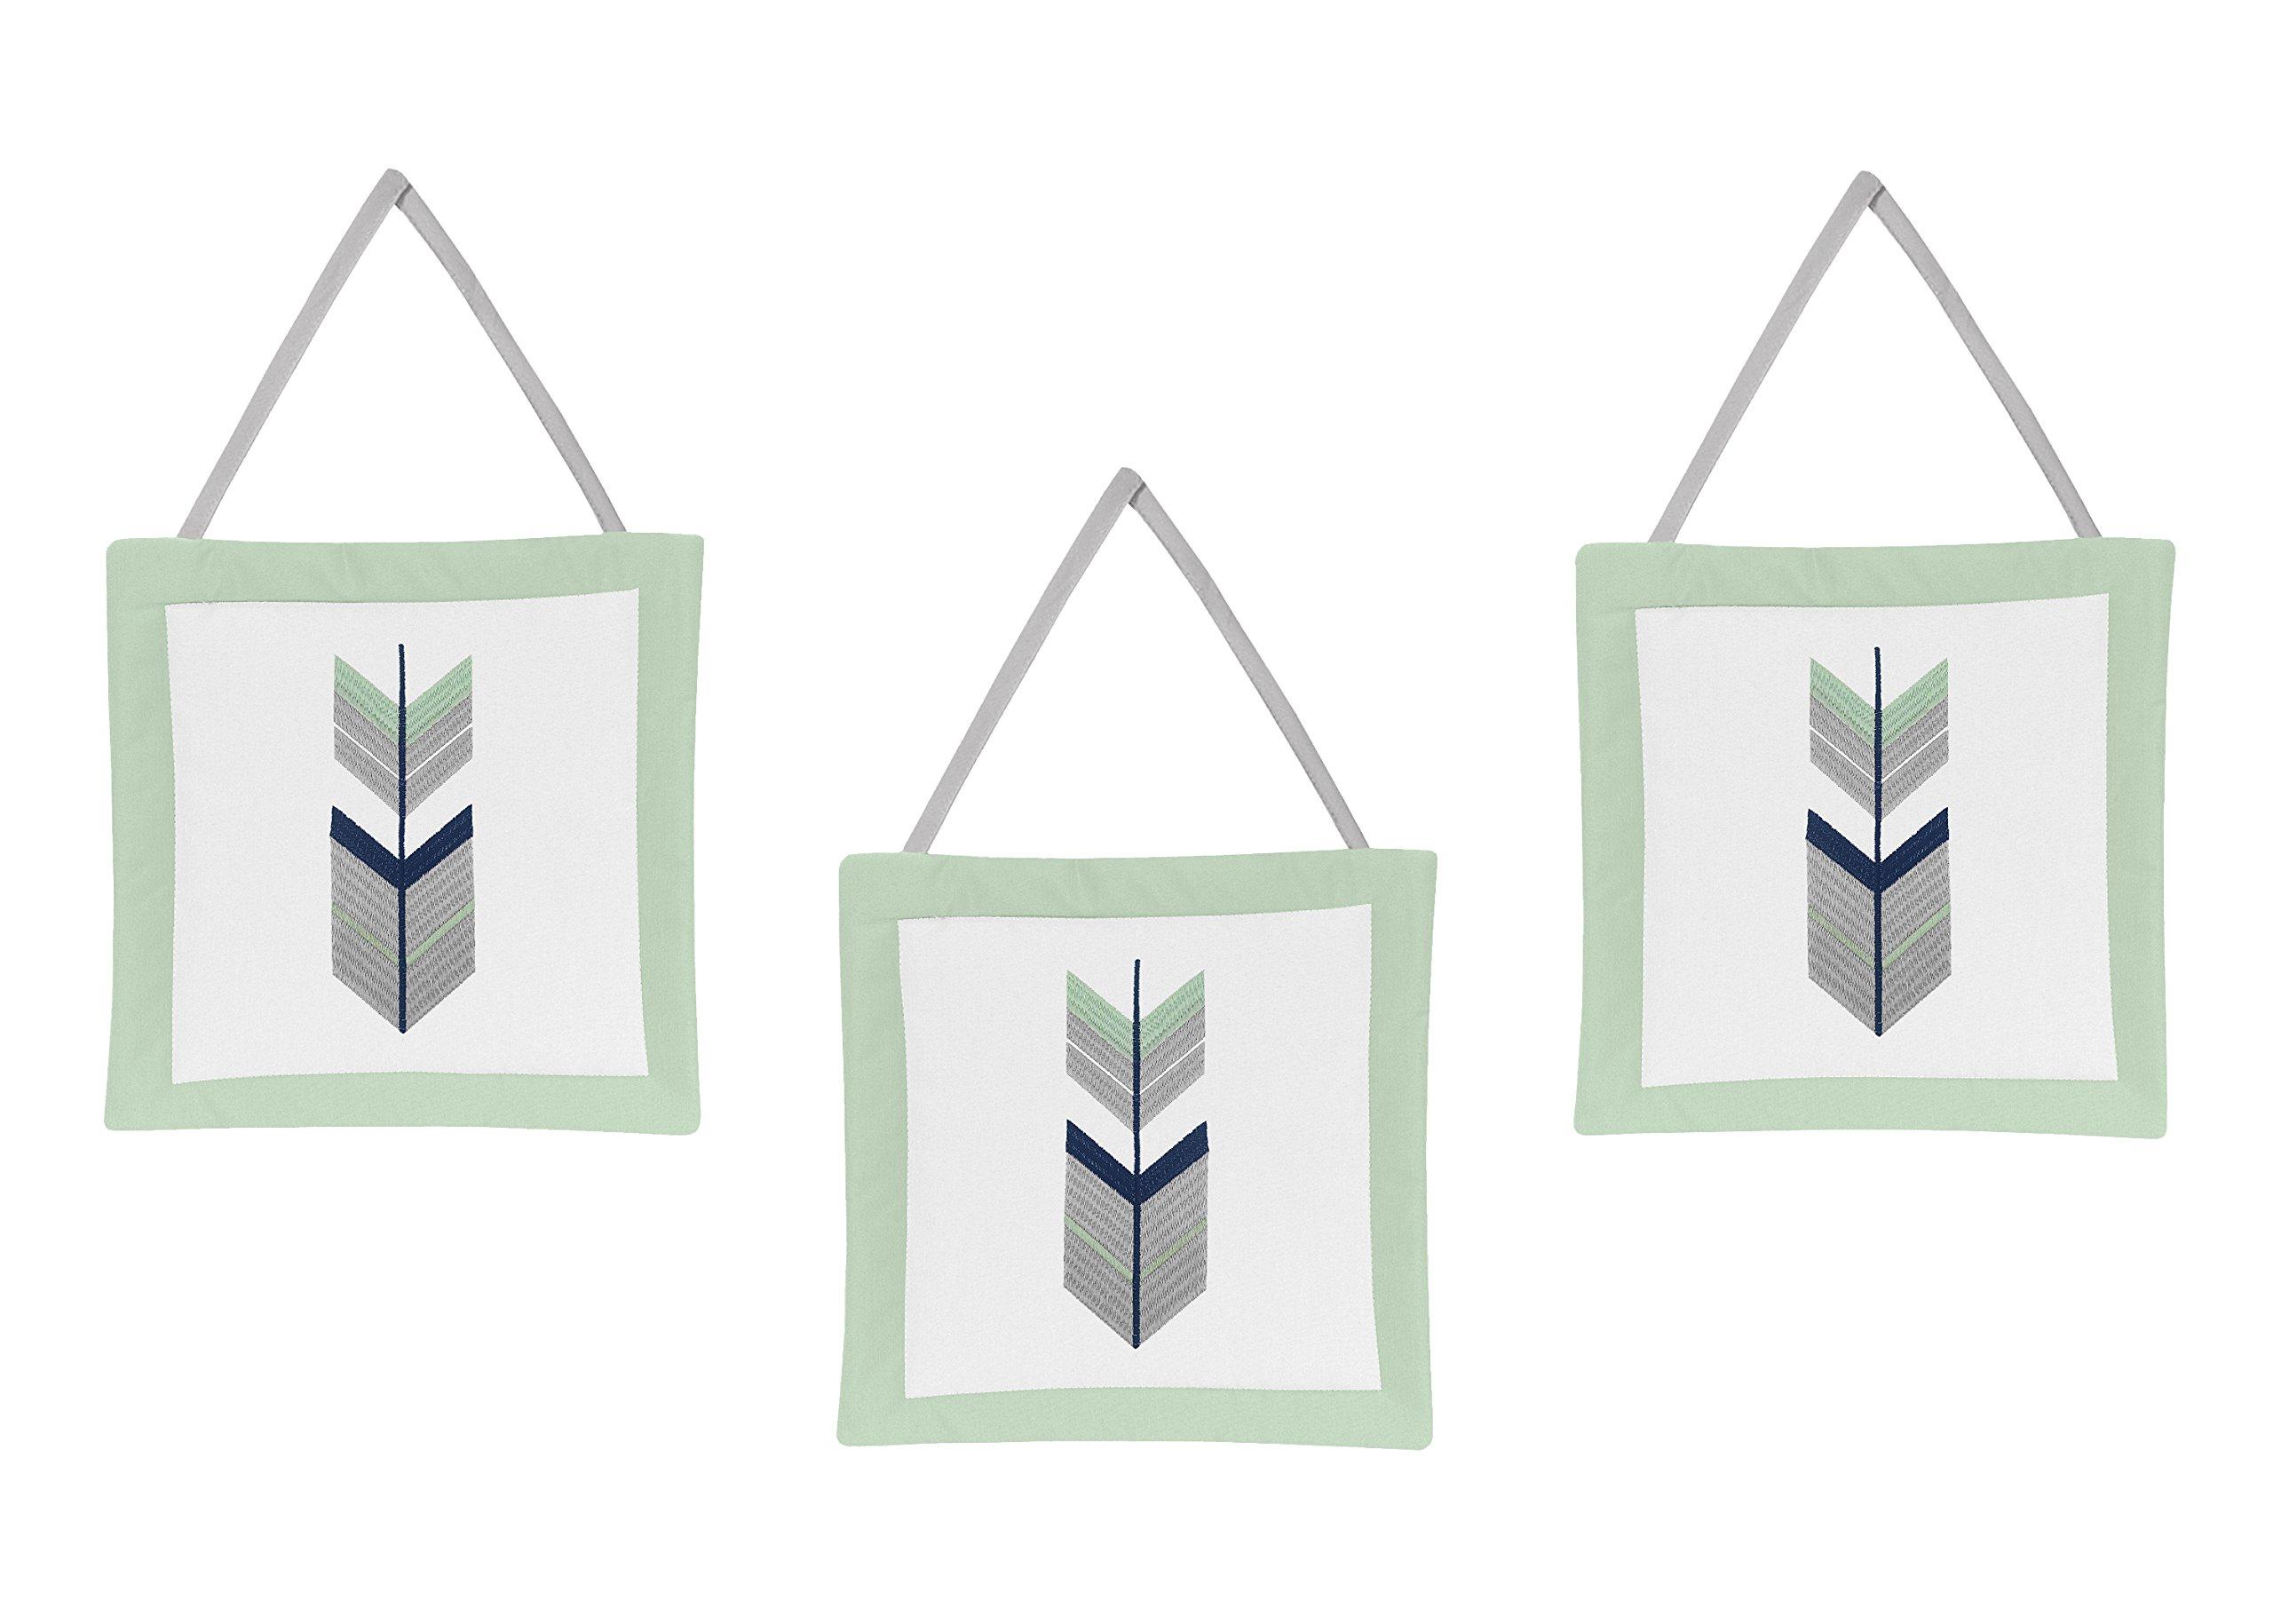 Sweet Jojo Designs Grey, Navy and Mint Woodland Arrow Print Girl or Boy Wall Hanging Accessories